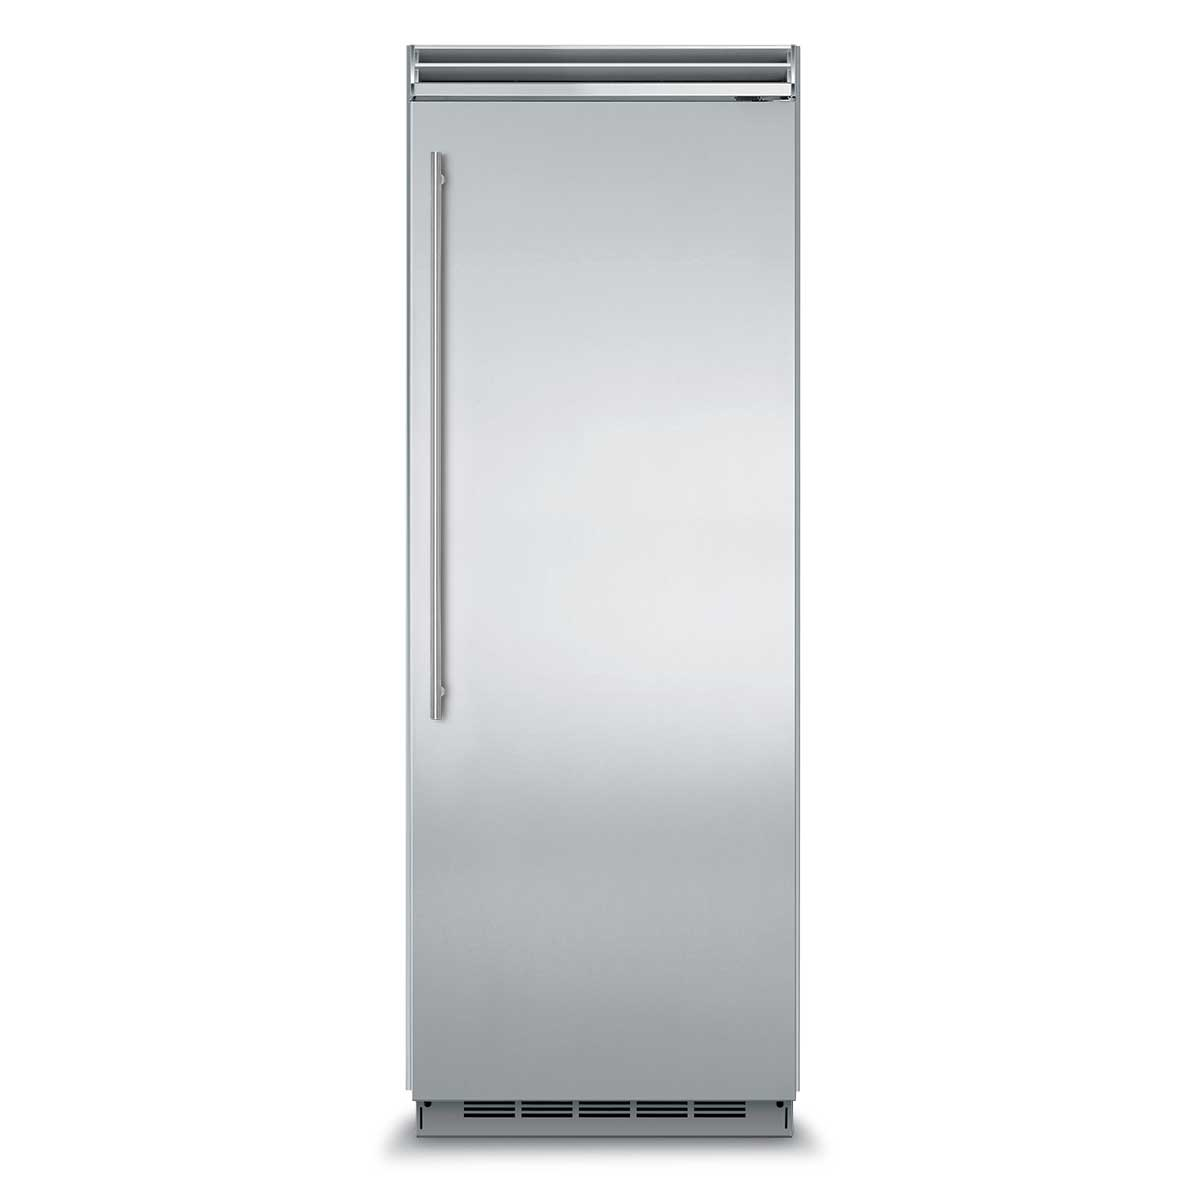 "Model: MP30RA2RS | Marvel  Marvel Professional Built-In 30"" All Refrigerator- Solid Stainless Steel Door   Right Hinge, Slim Designer Handle"